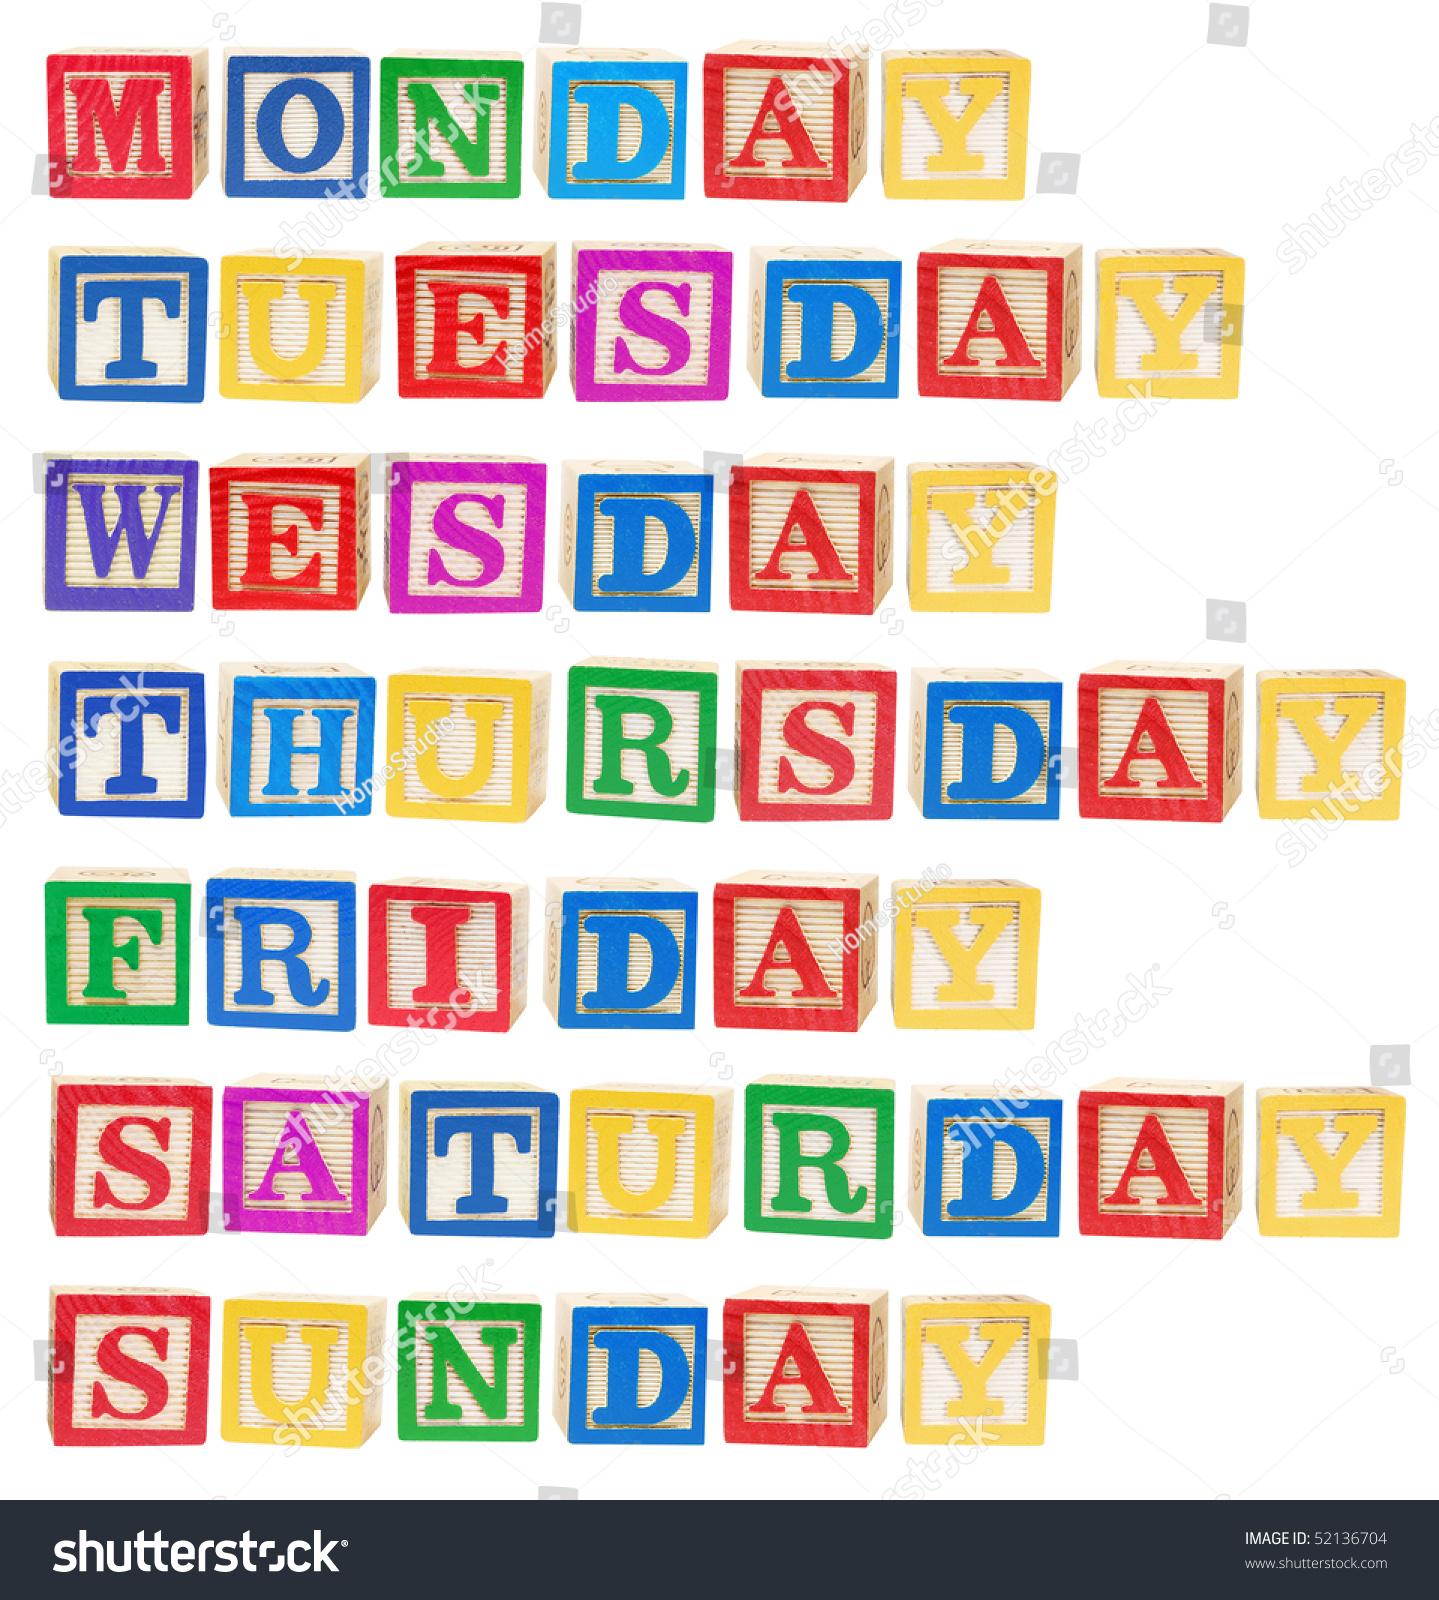 Best 60 Days of the Week Wallpaper on HipWallpaper Happy 1439x1600